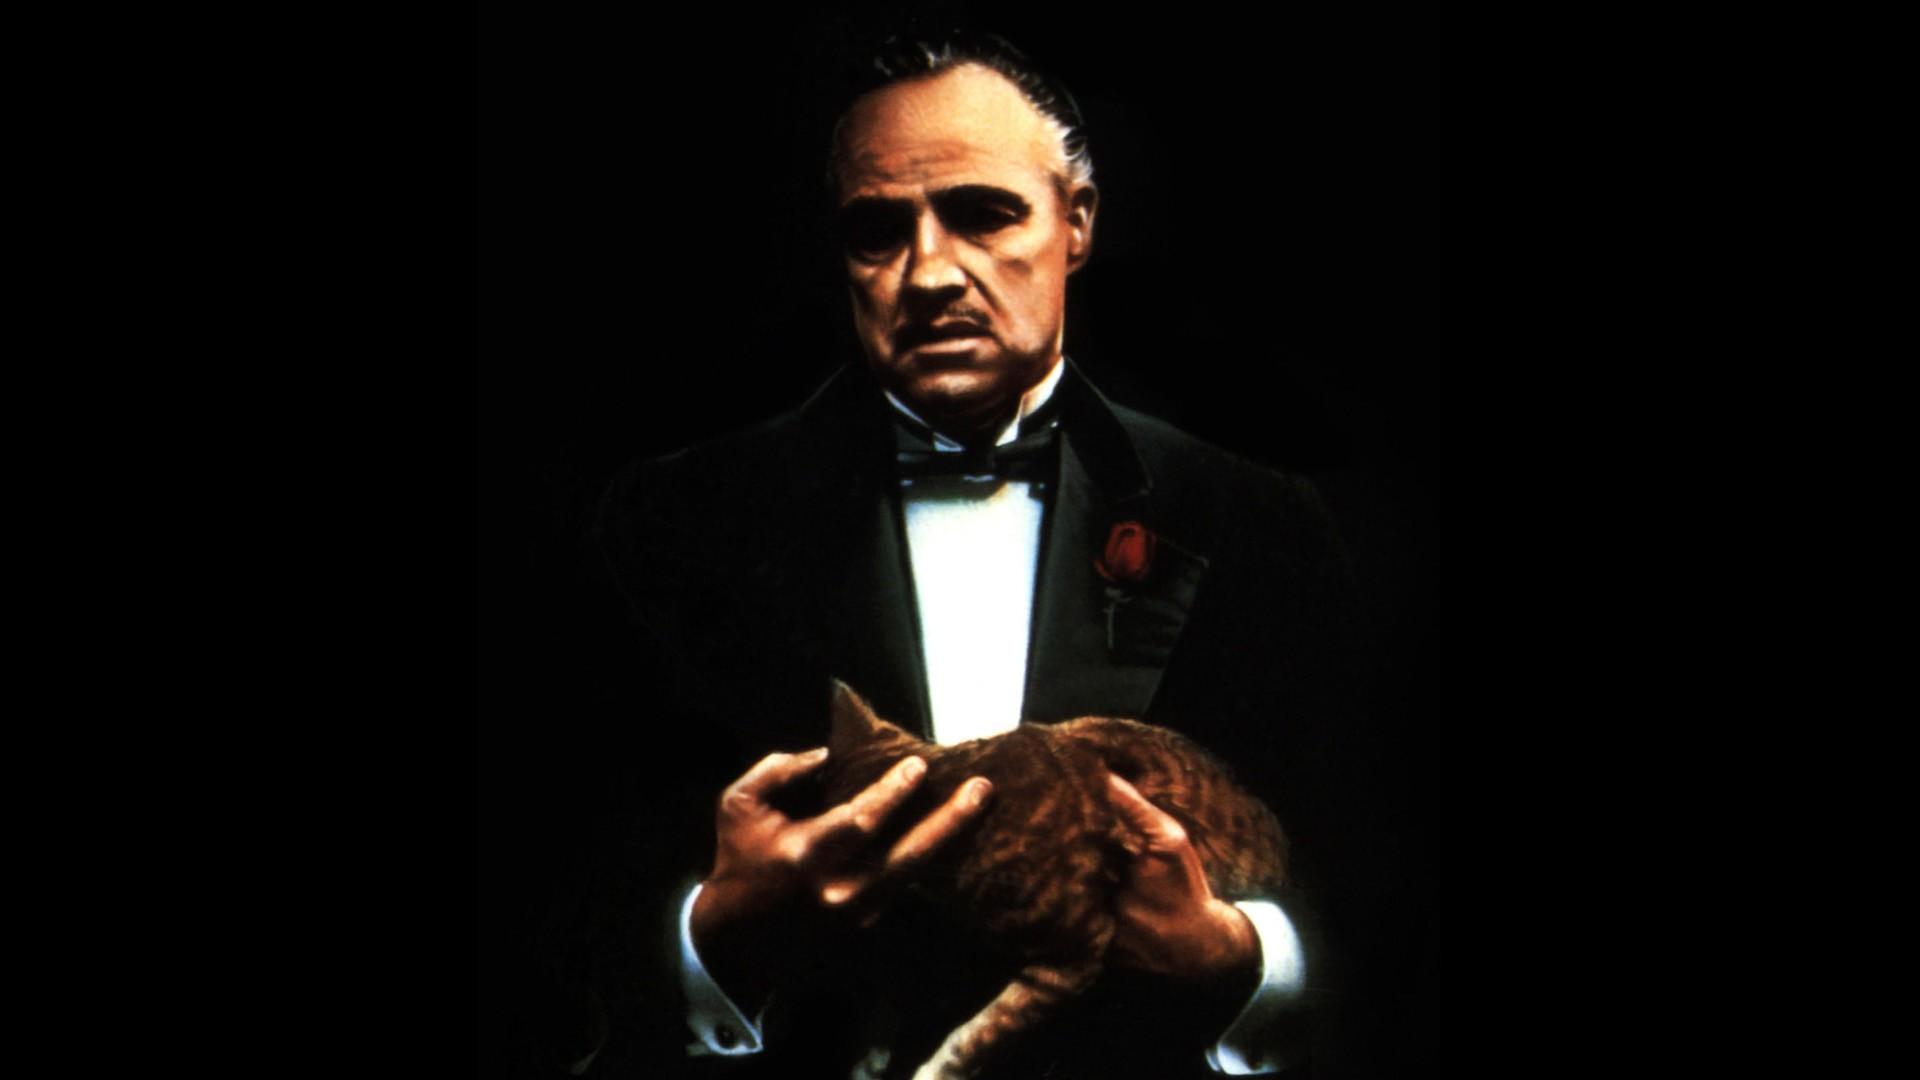 https://get.wallhere.com/photo/cat-musician-guitarist-singing-The-Godfather-Marlon-Brando-Vito-Corleone-performance-stage-screenshot-speech-284228.jpg